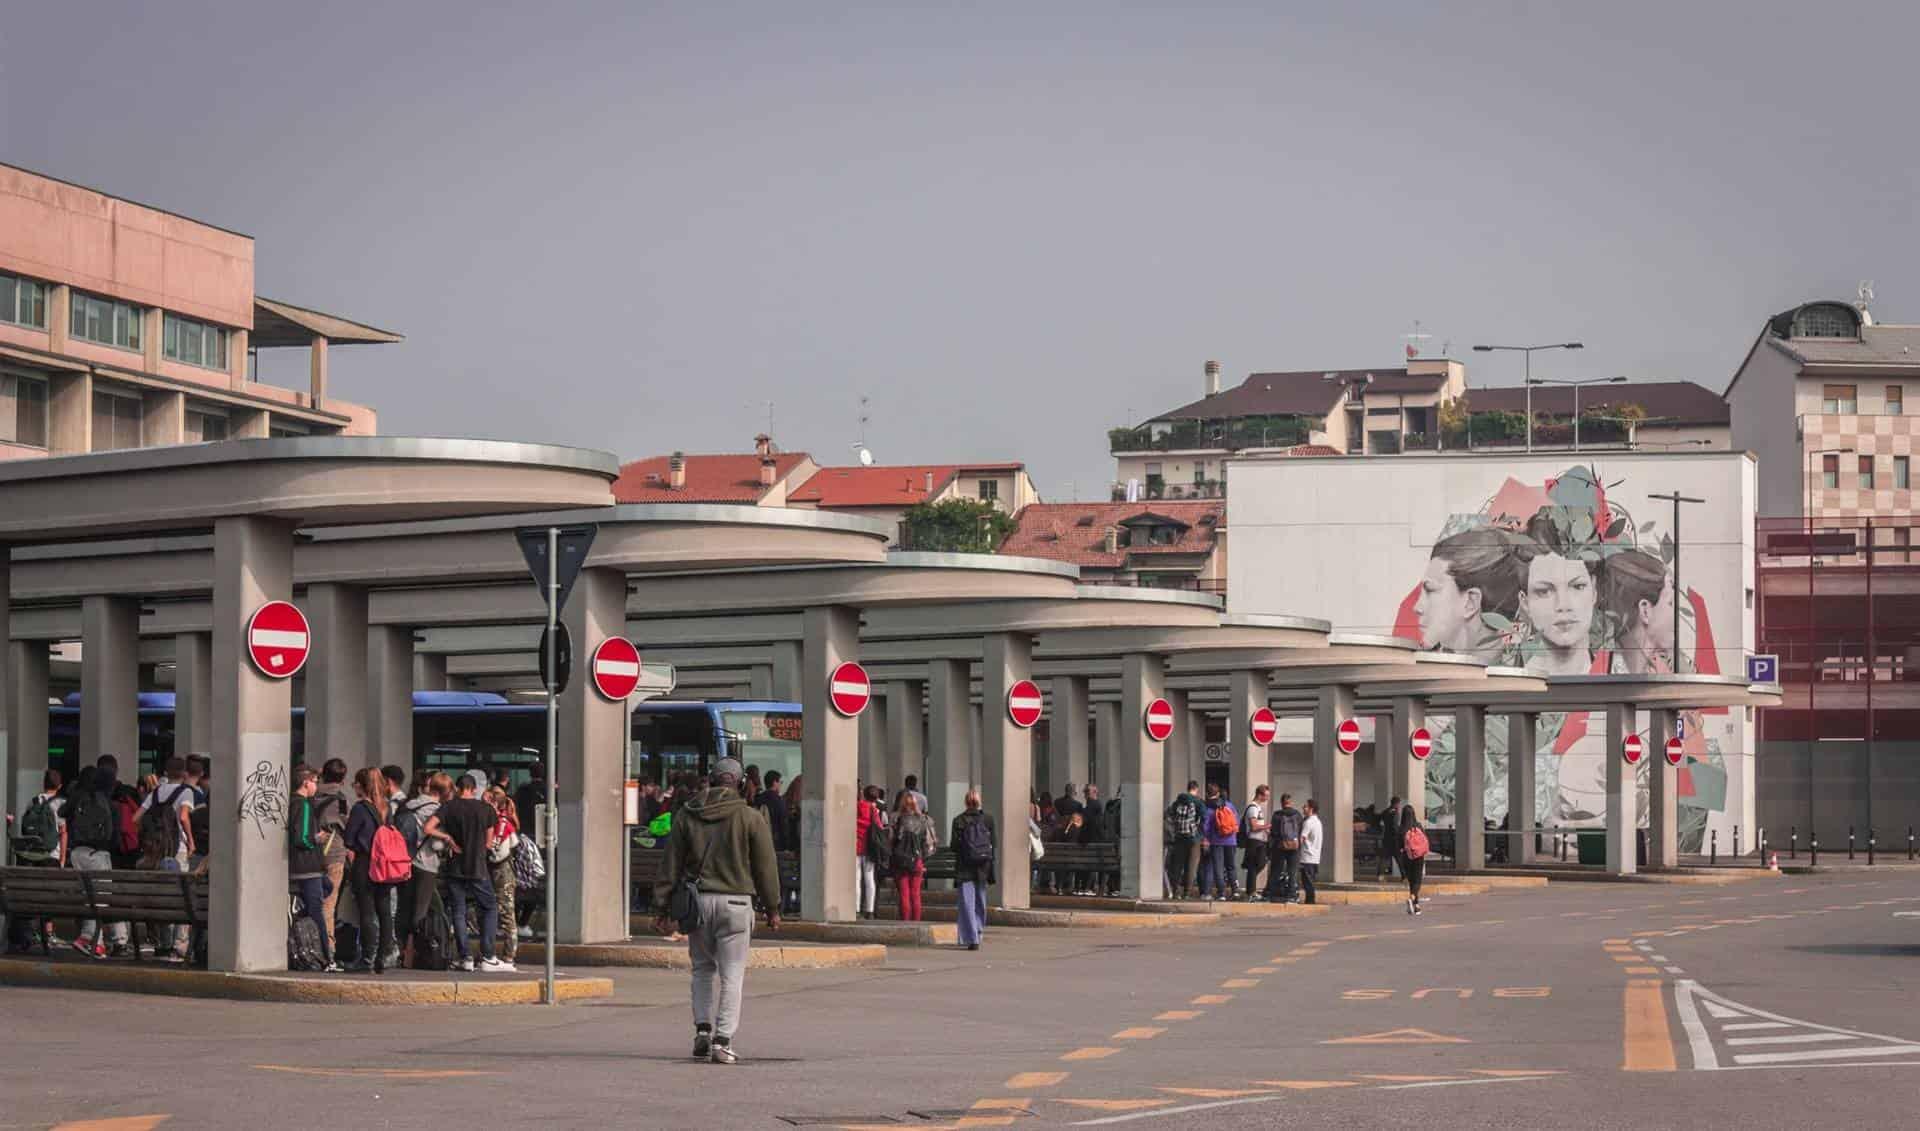 Bergamo bus station, Italy